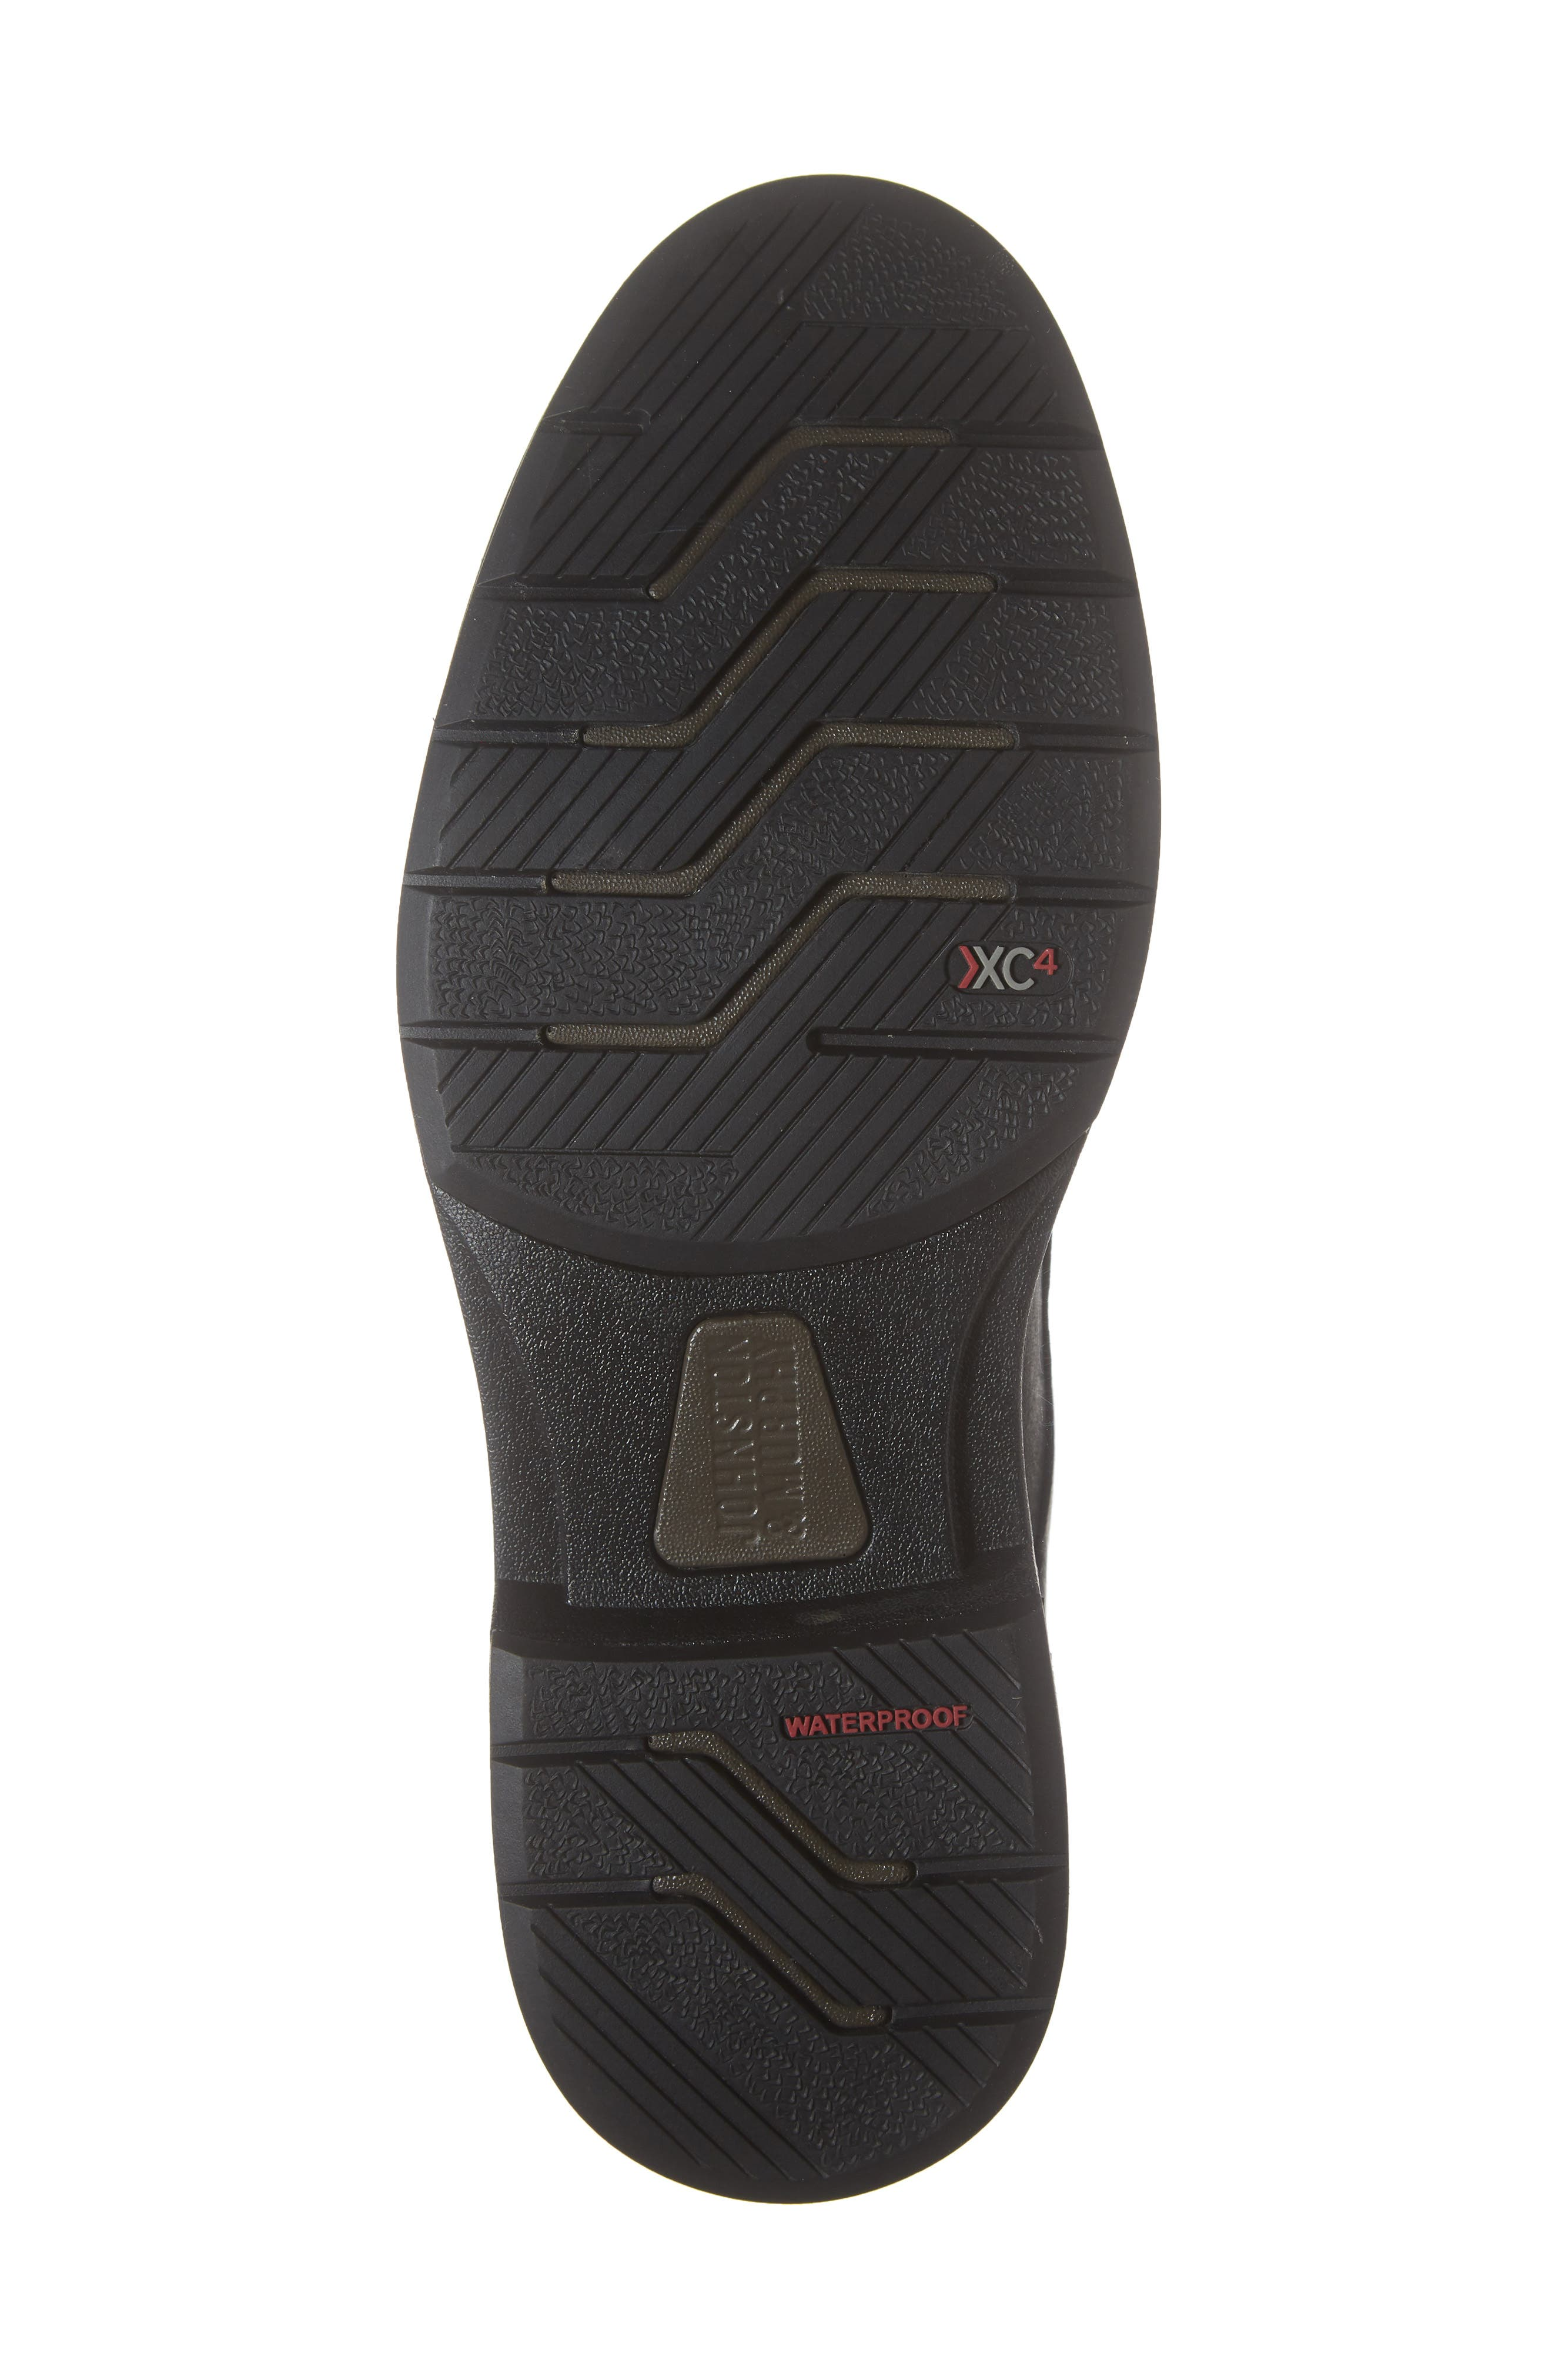 Rutledge Waterproof Moc Toe Boot,                             Alternate thumbnail 6, color,                             BLACK LEATHER